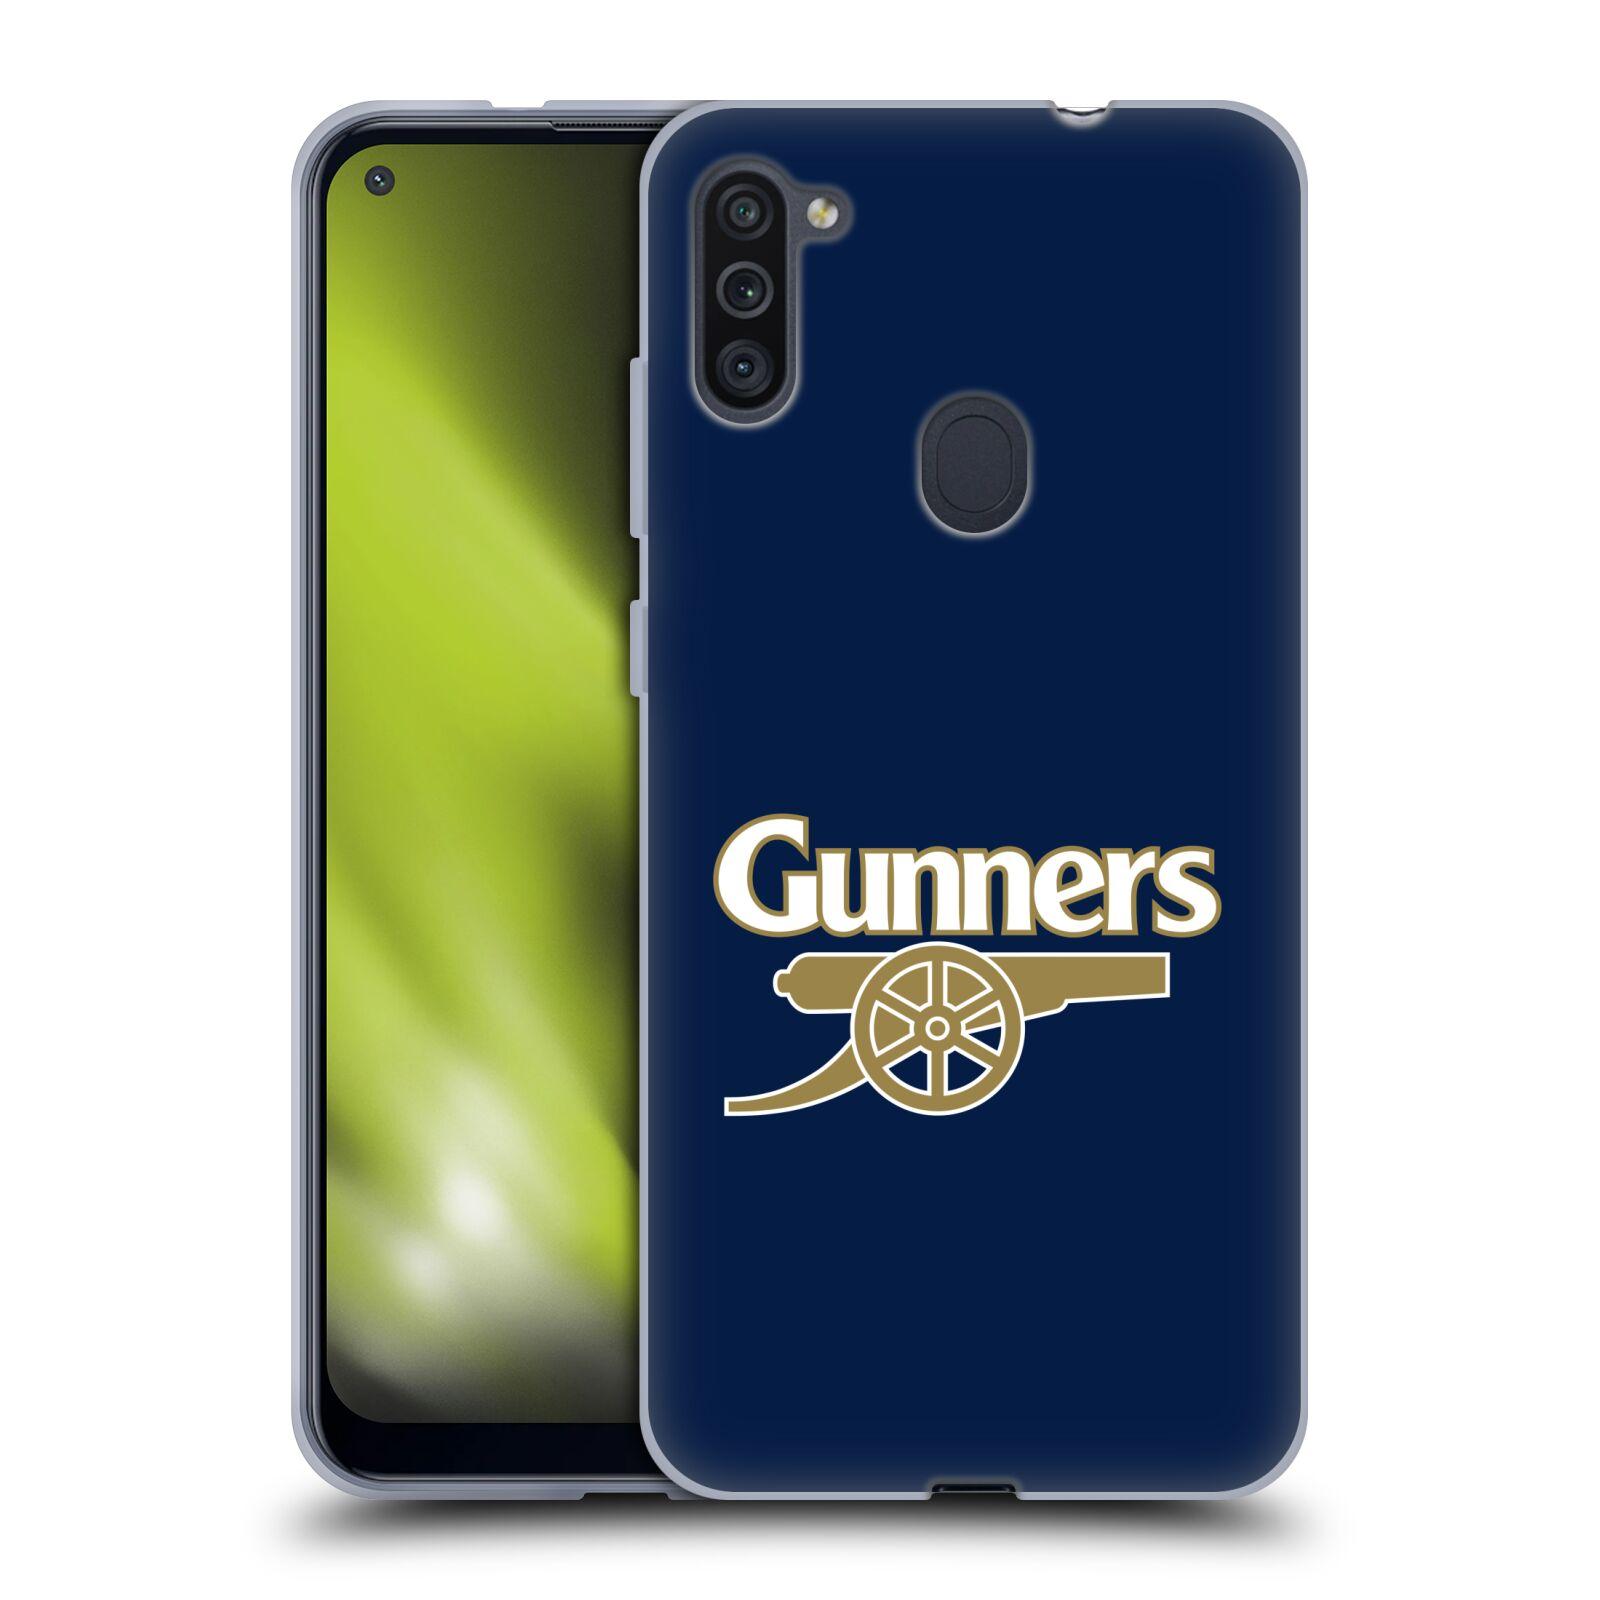 Silikonové pouzdro na mobil Samsung Galaxy M11 - Head Case - Arsenal FC - Gunners